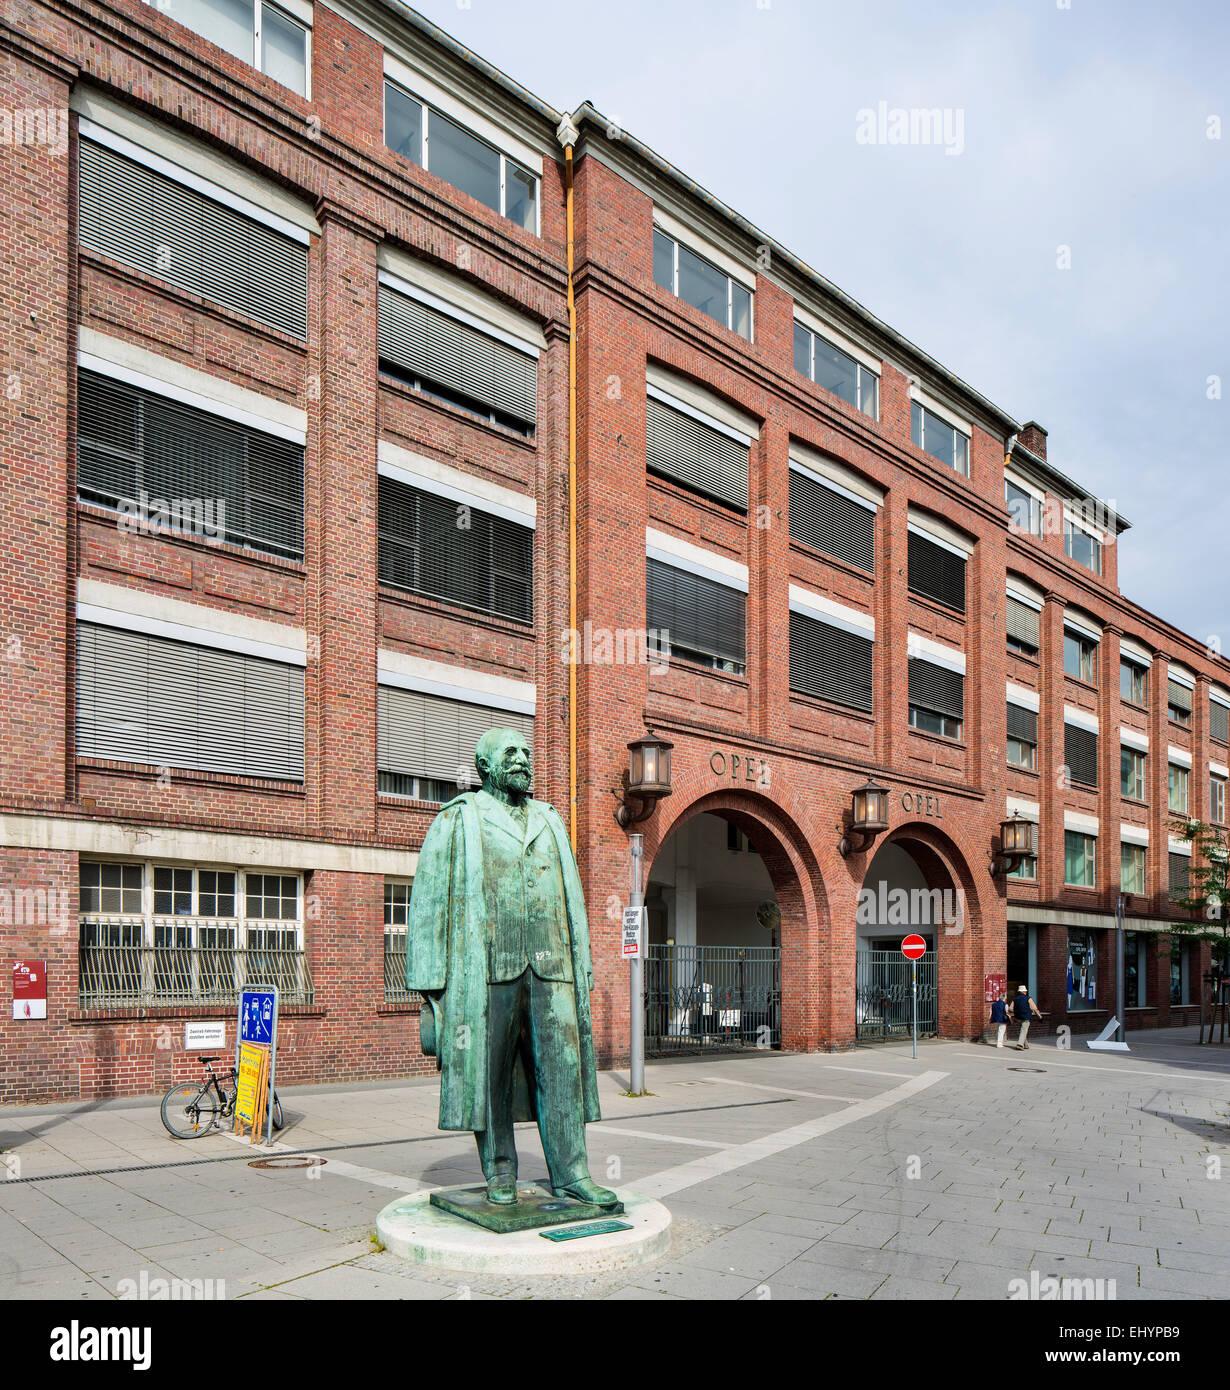 Opel Forum, former factory halls of Adam Opel AG, Rüsselsheim, Hesse, Germany - Stock Image